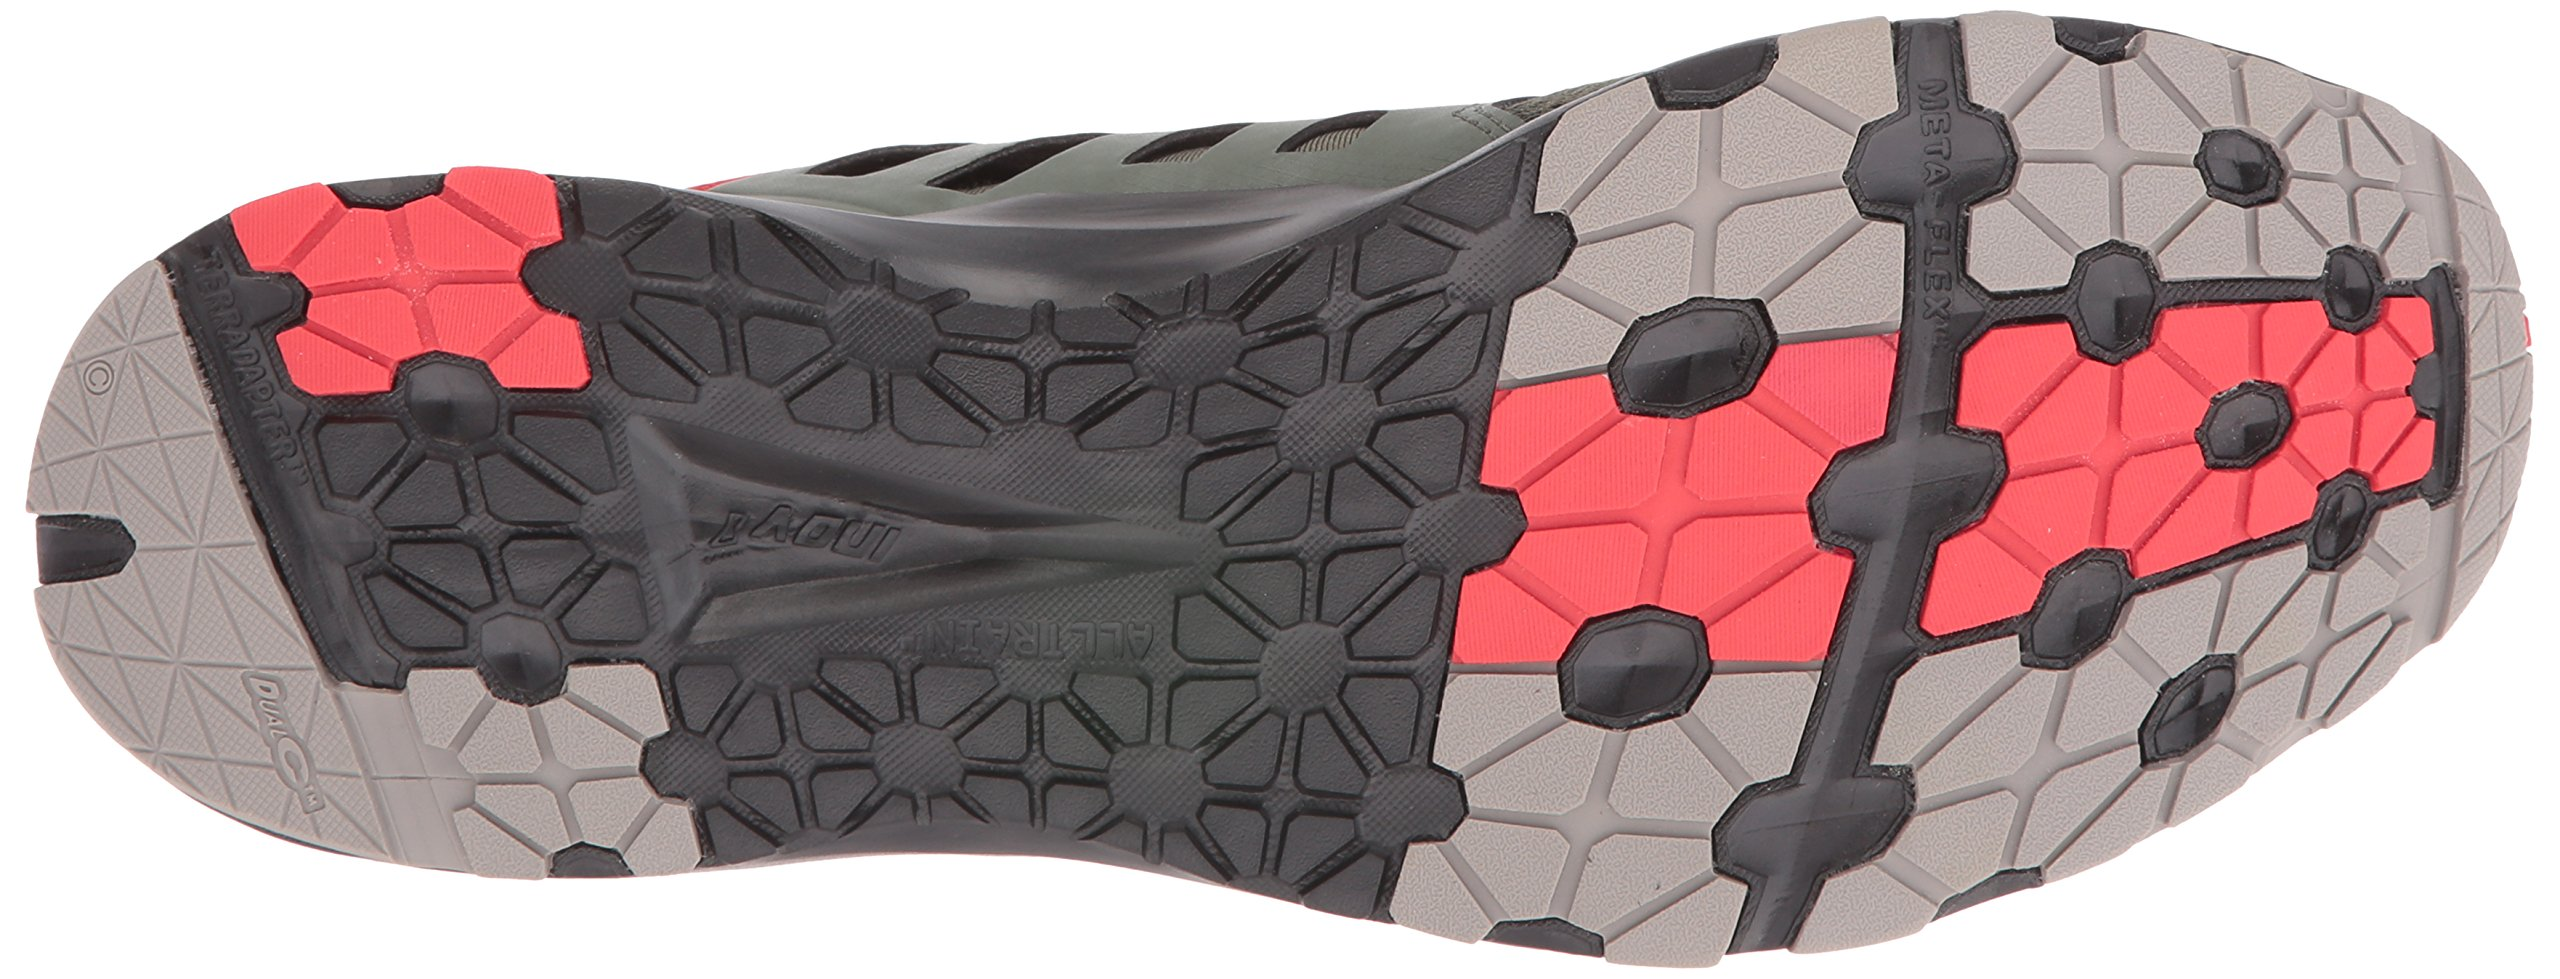 Inov-8 Men's All Train 215 Cross-Trainer Shoe, Dark Green/Red/Black, 12 D US by Inov-8 (Image #3)